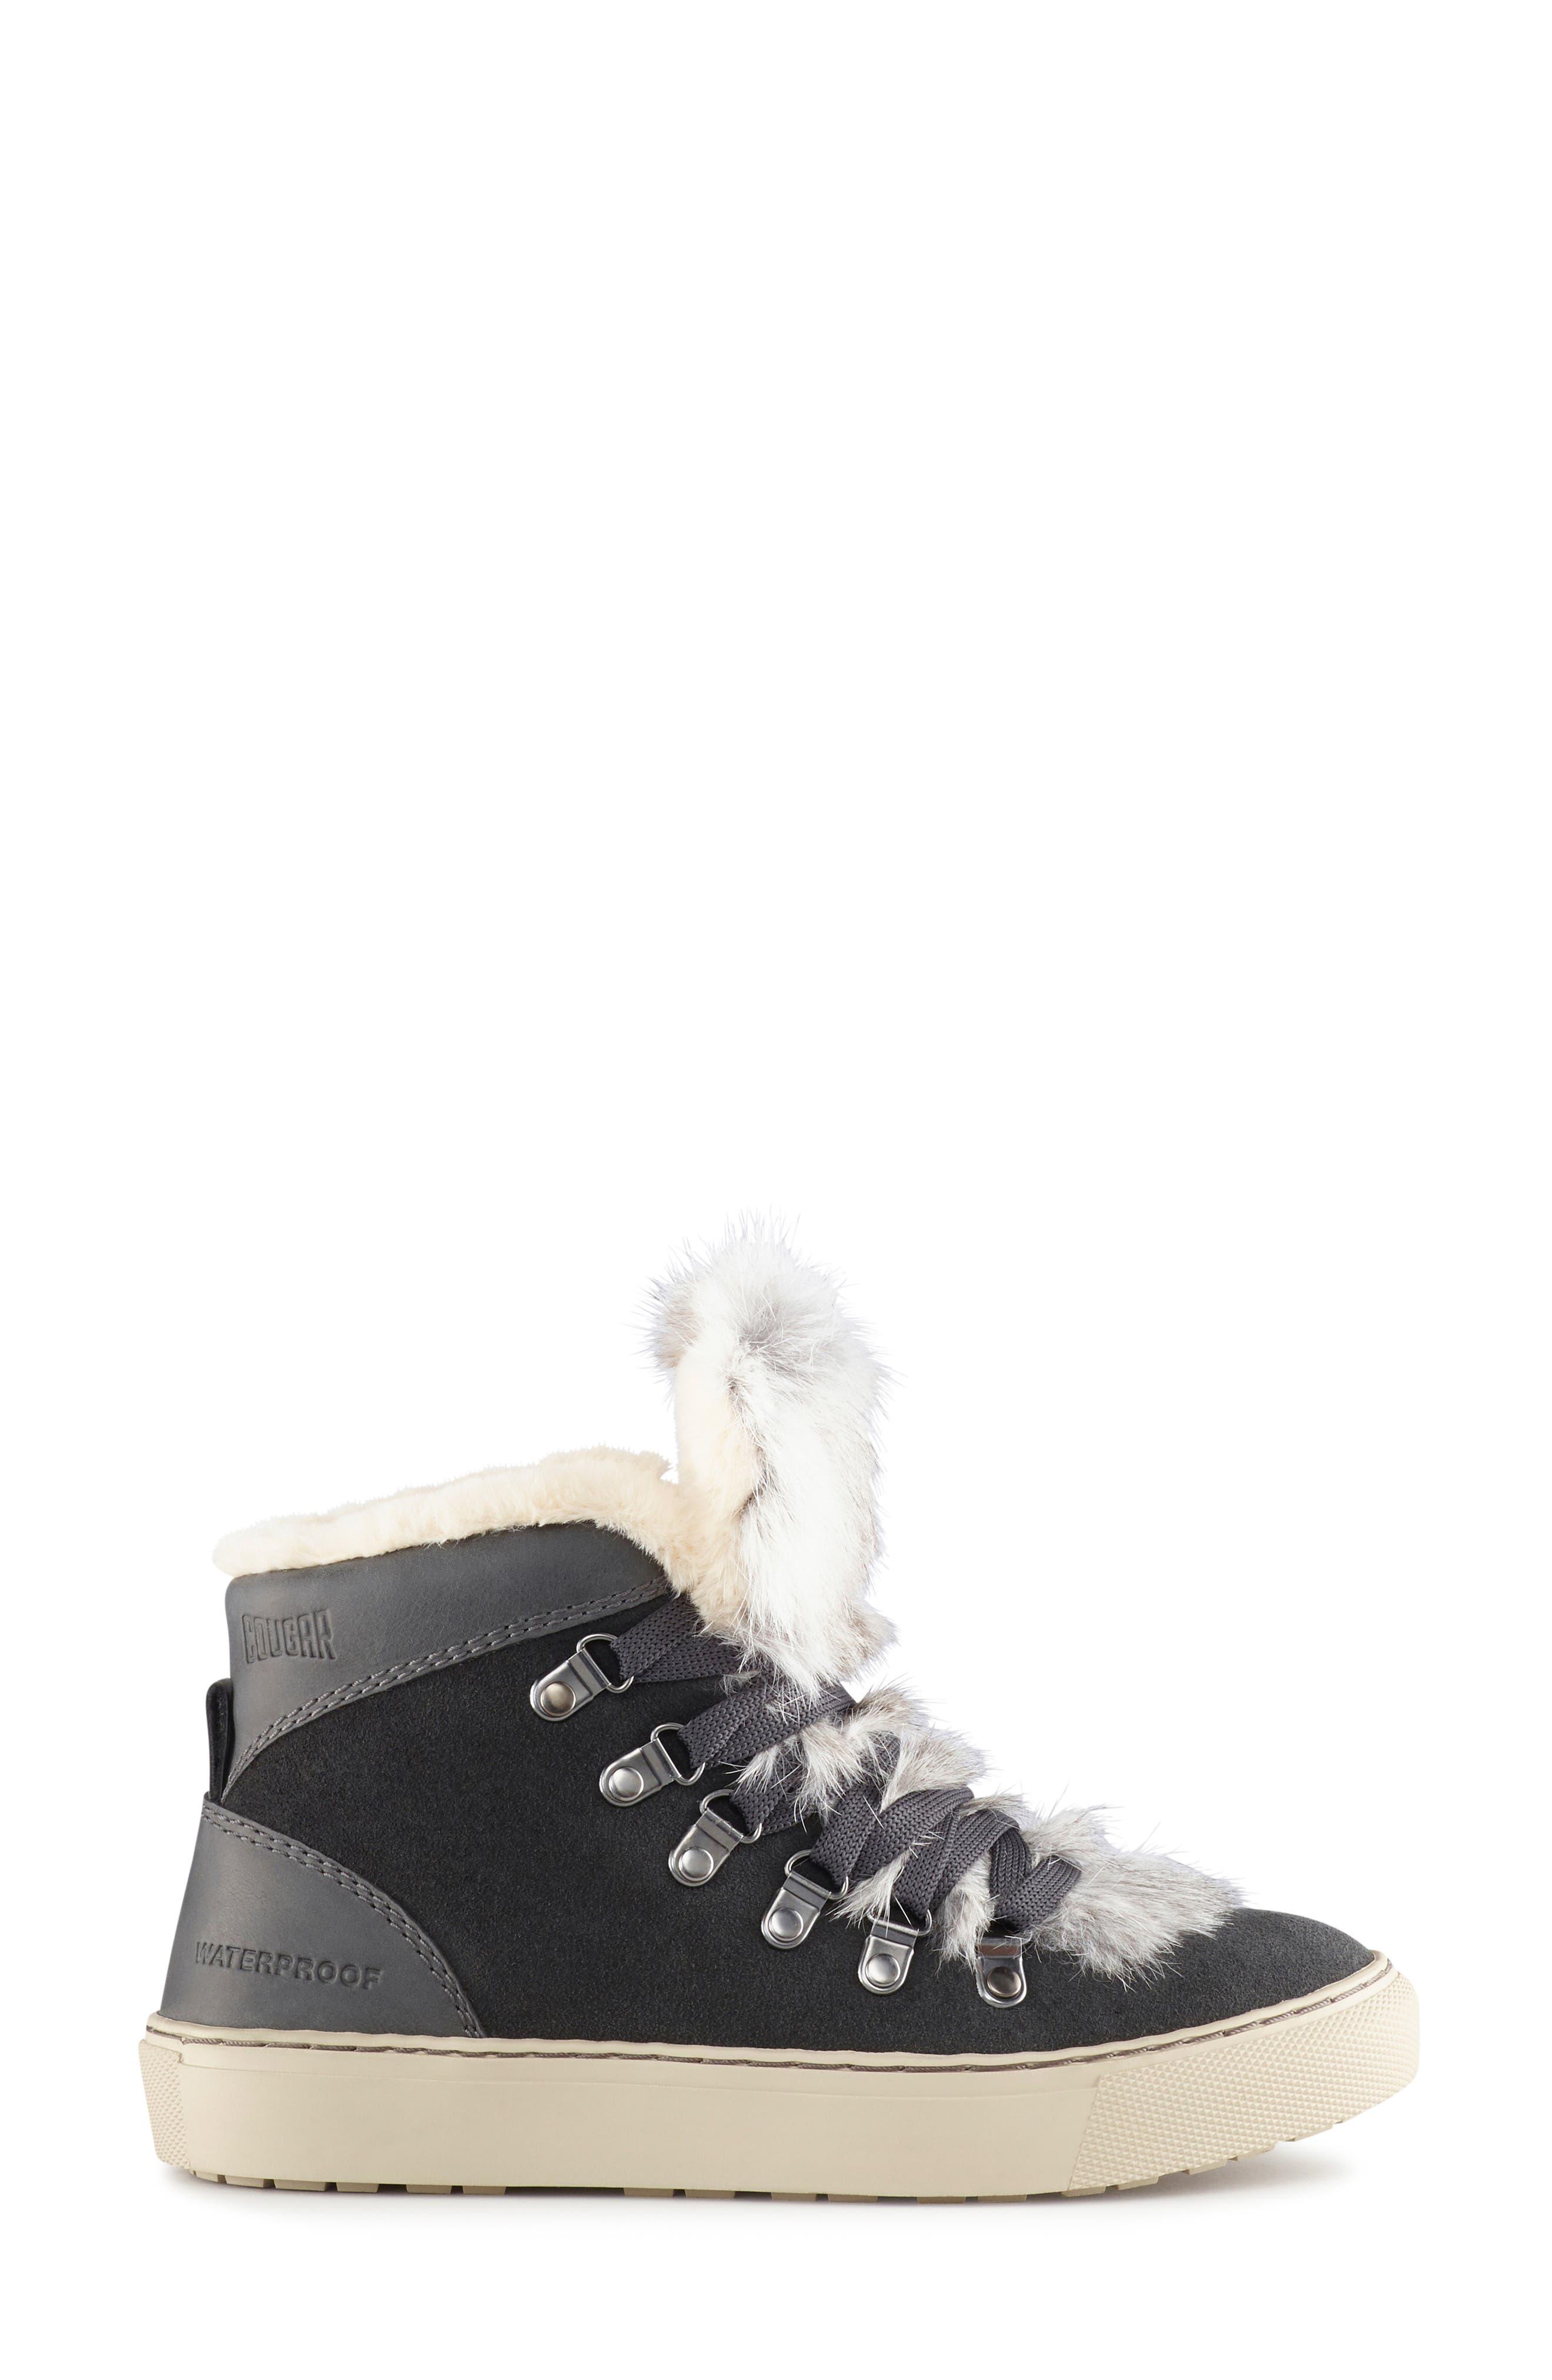 COUGAR,                             Dani High Top Sneaker with Genuine Rabbit Fur Trim,                             Alternate thumbnail 2, color,                             PEWTER SUEDE